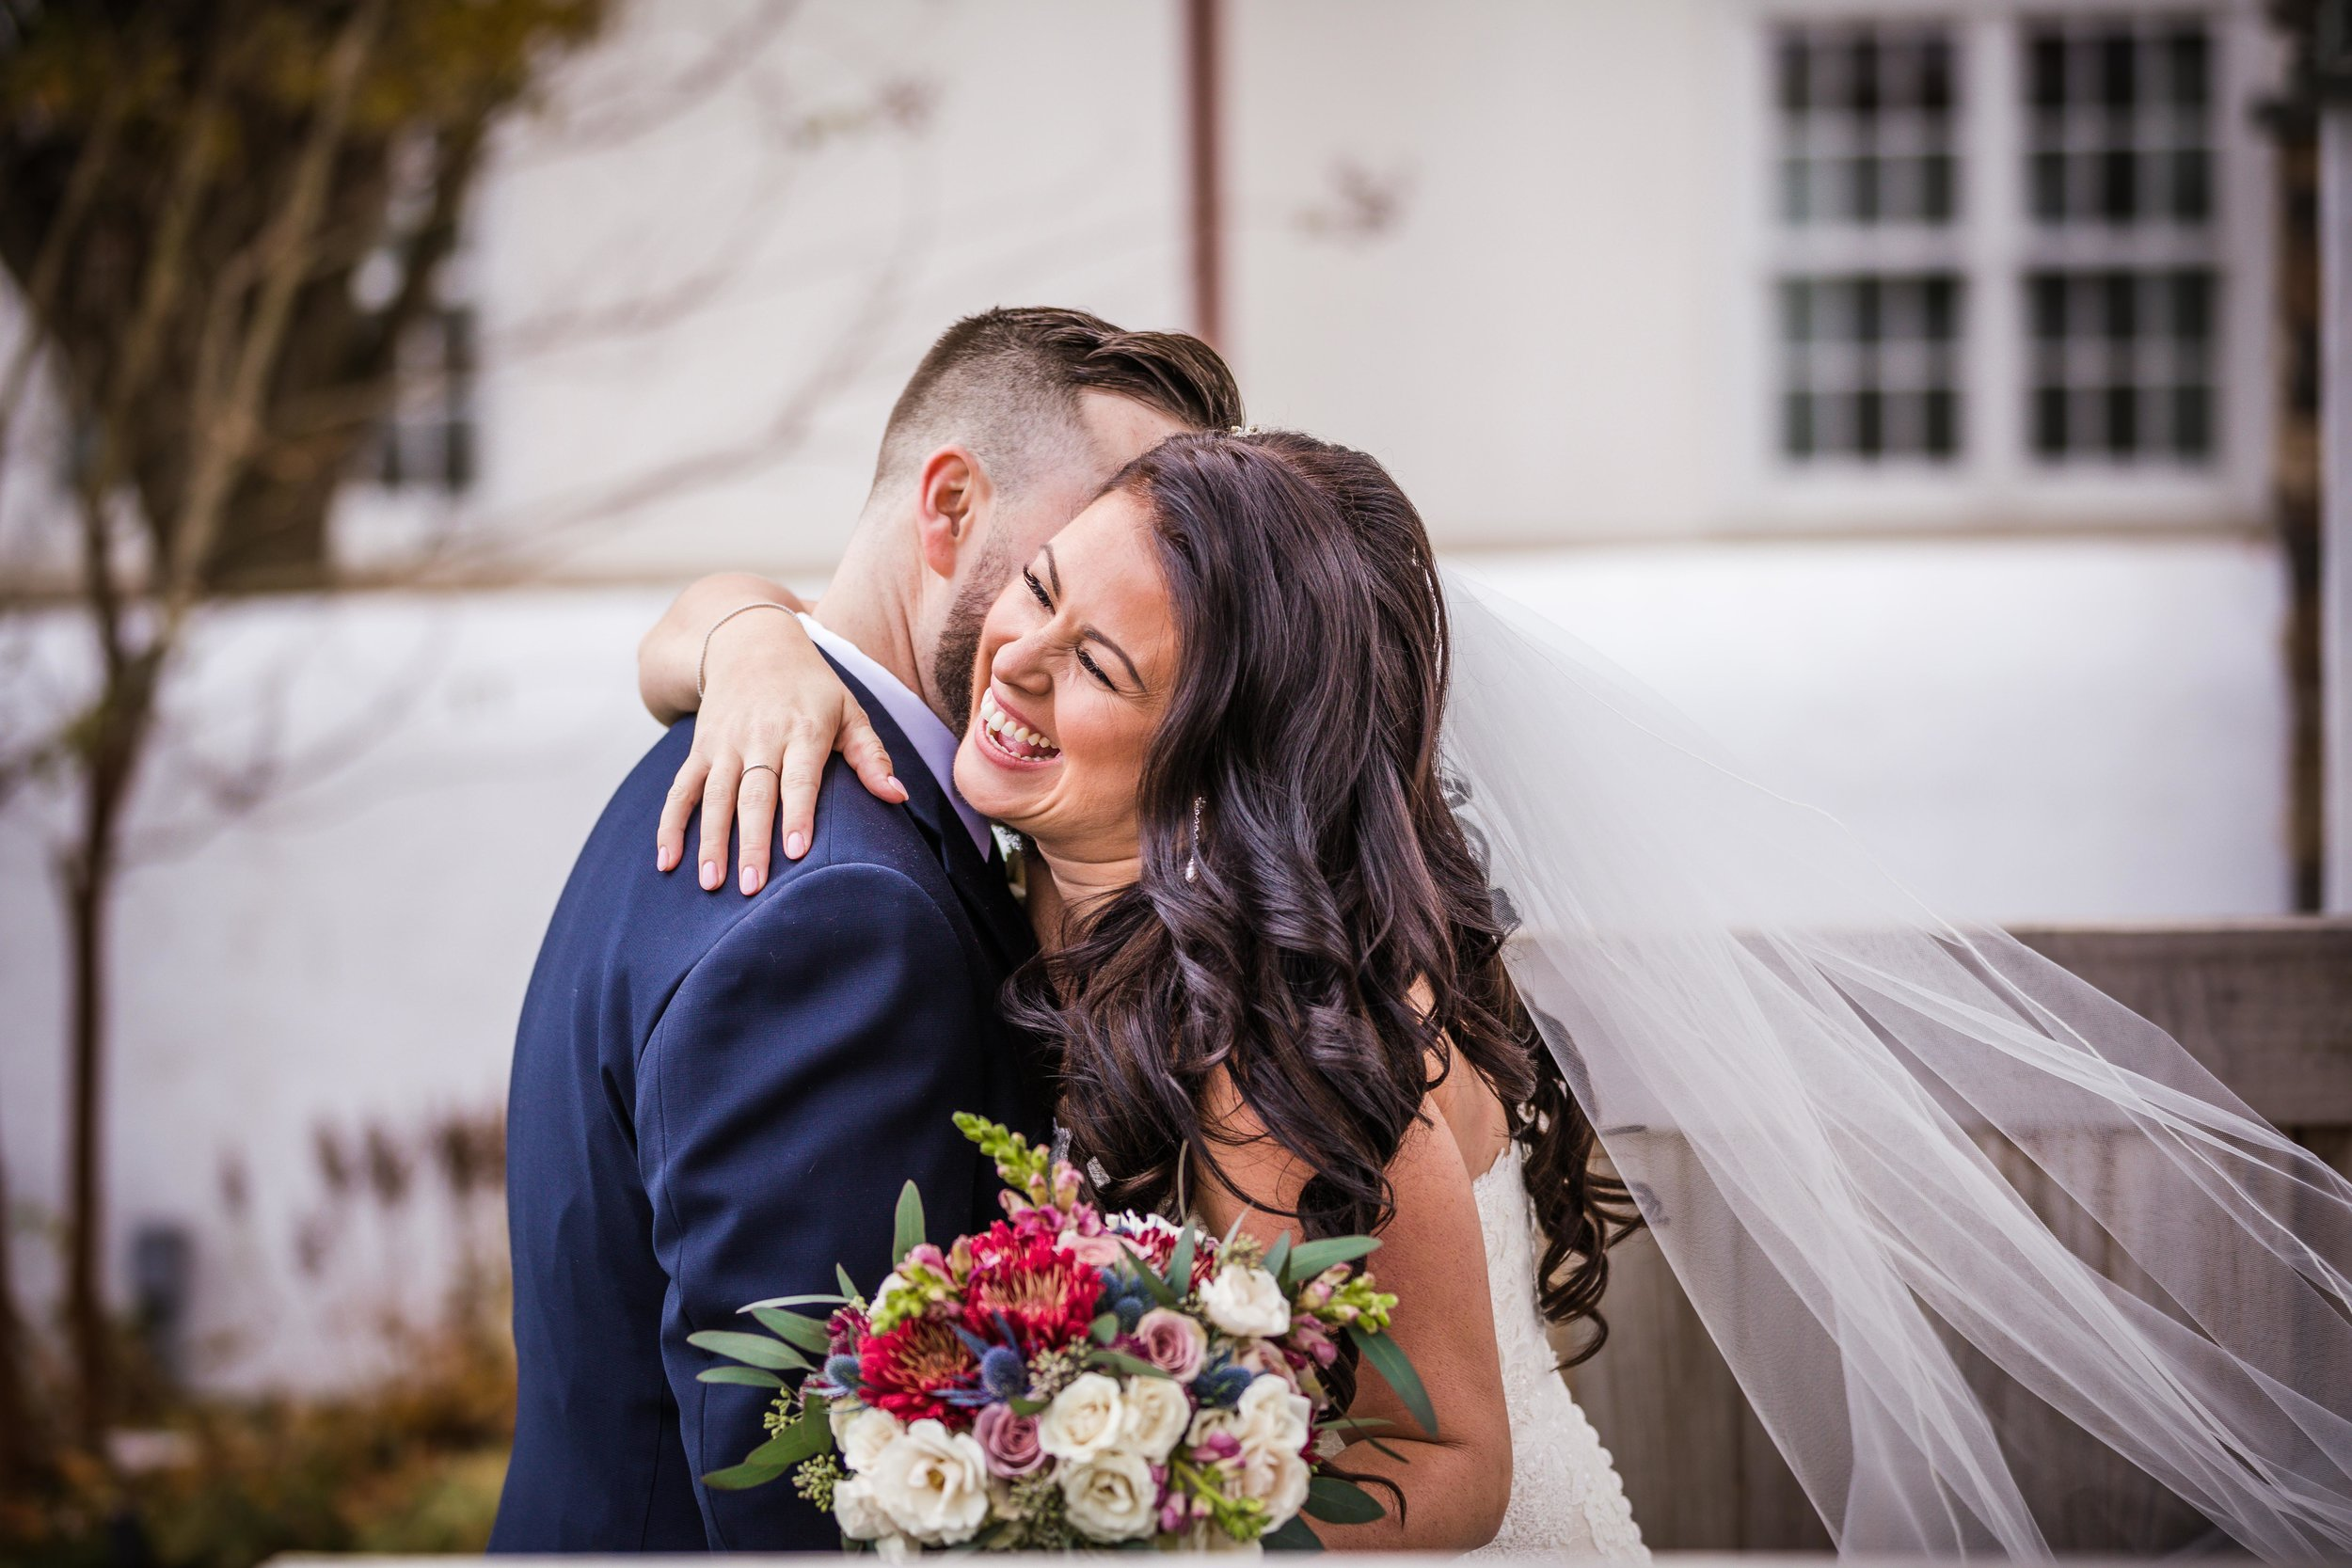 Diana and Henry - Normandy Farms Wedding Photography - Estras-53.jpg